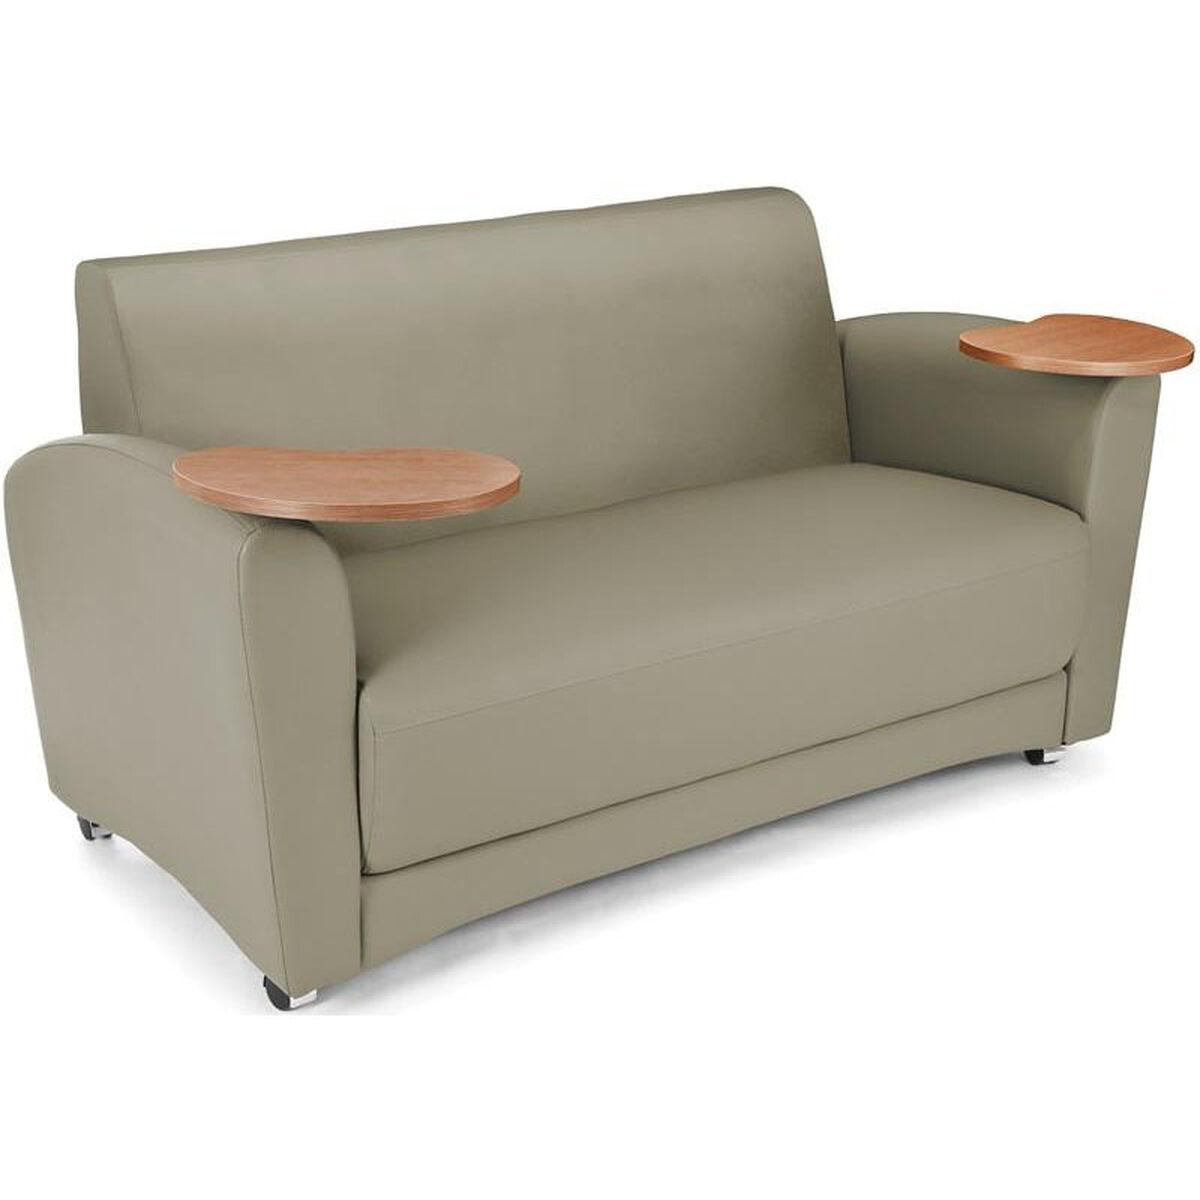 interplay tablet sofa taupe 822 pu607 bronz. Black Bedroom Furniture Sets. Home Design Ideas